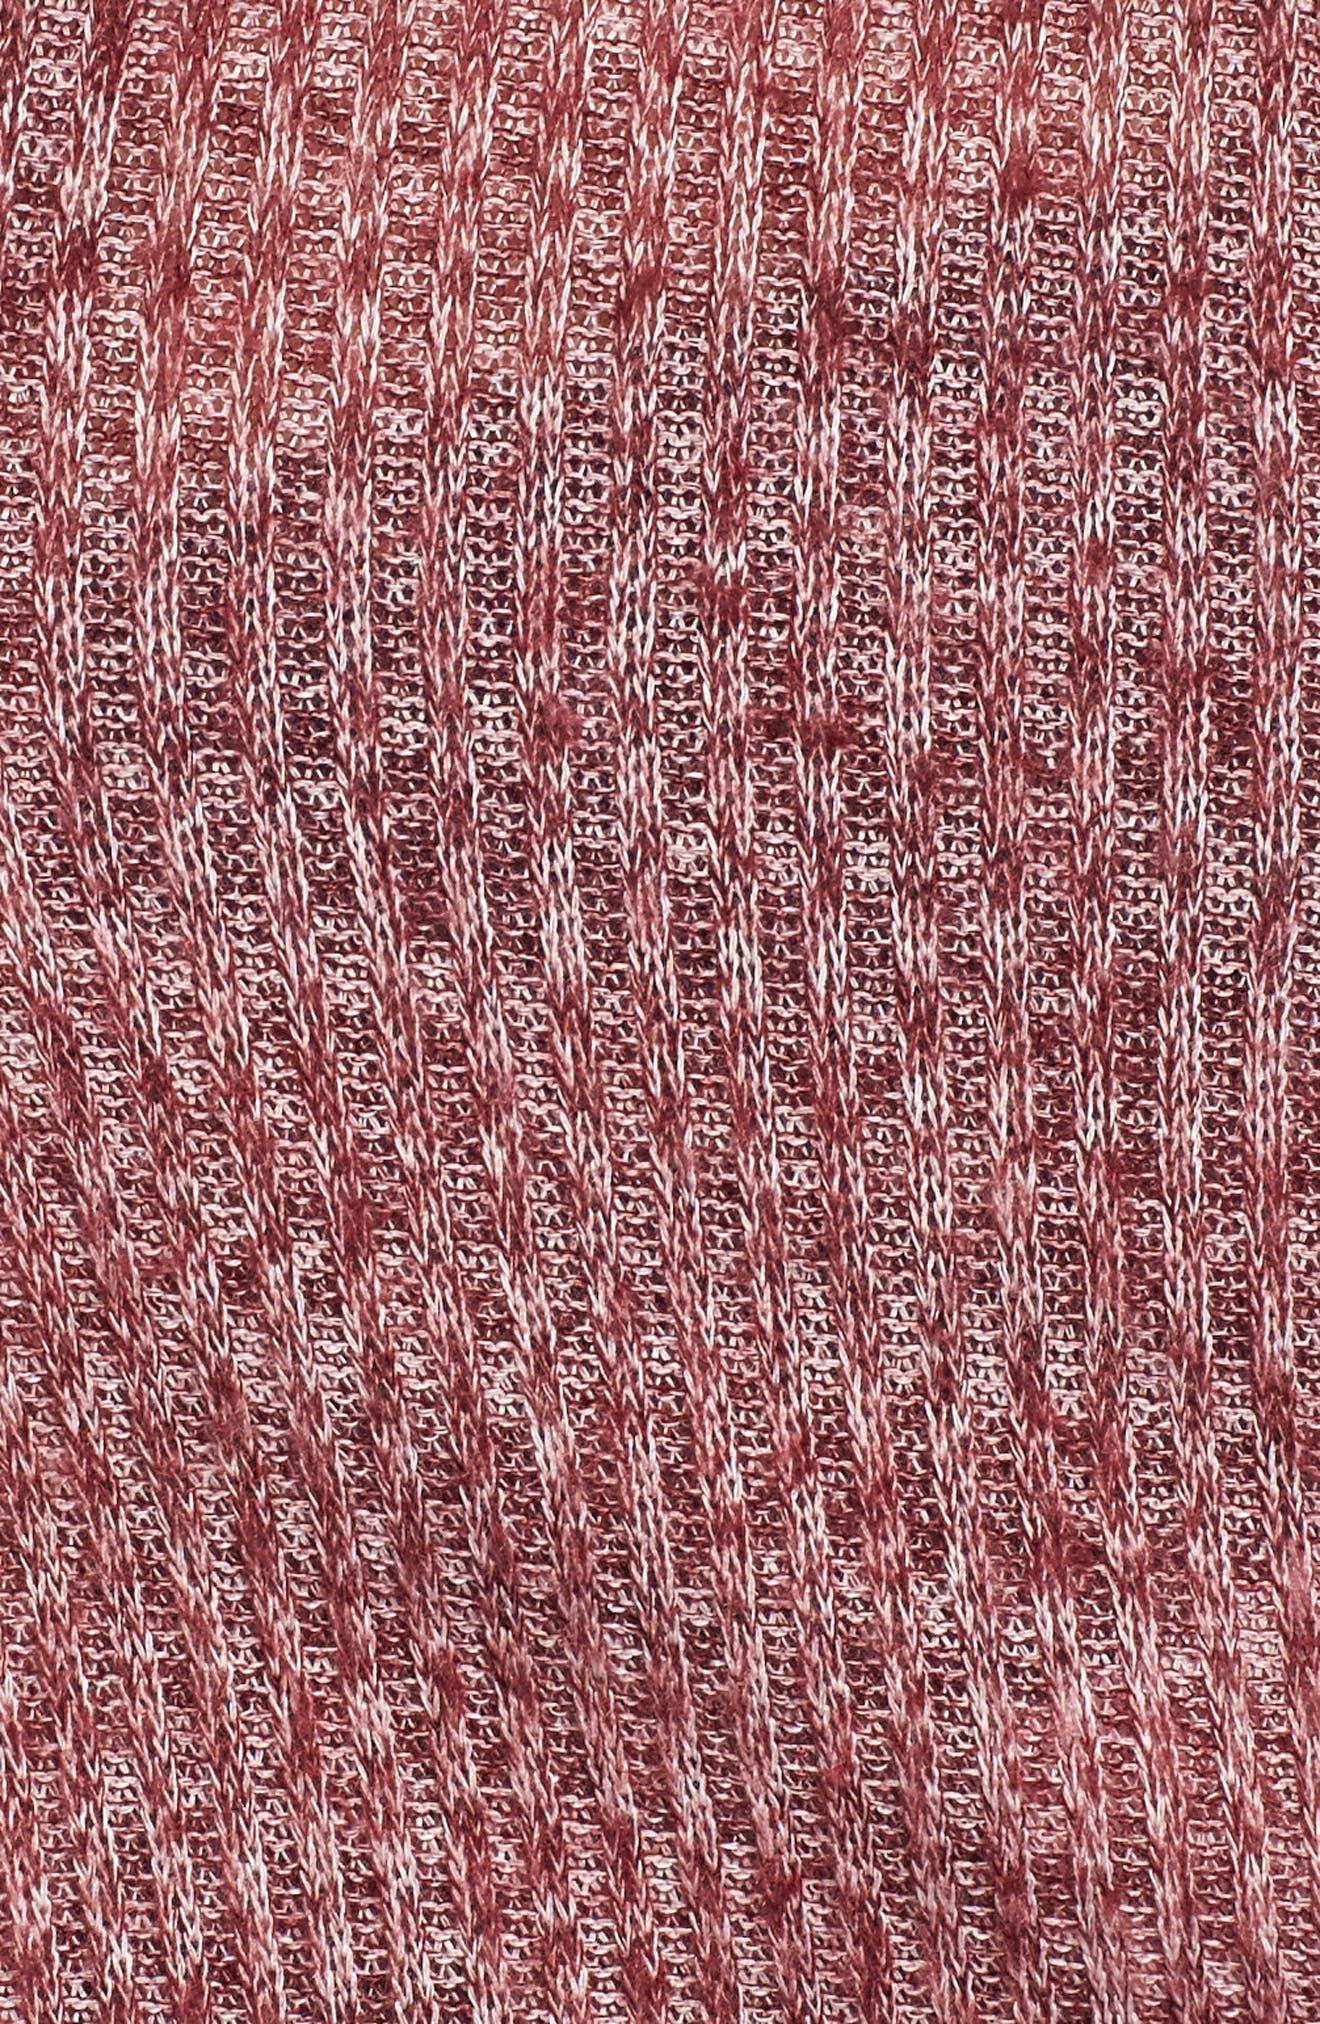 Rib Knit Corset Top,                             Alternate thumbnail 5, color,                             Burgundy Royale